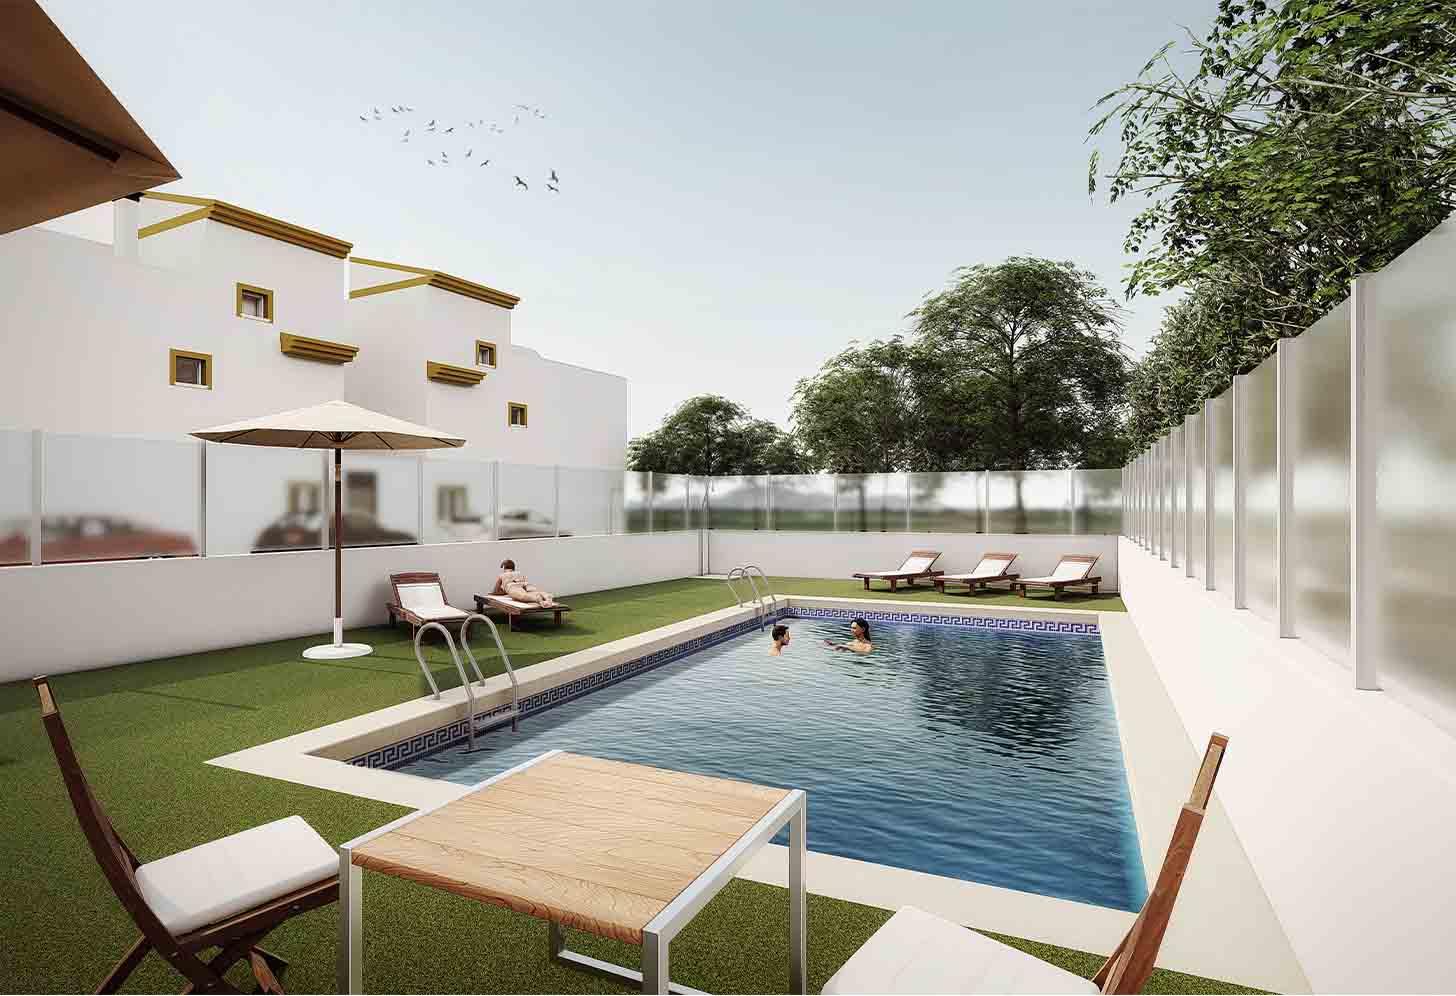 immobilier neuf espagne costa blanca on-d12 santa rosalia village piscine